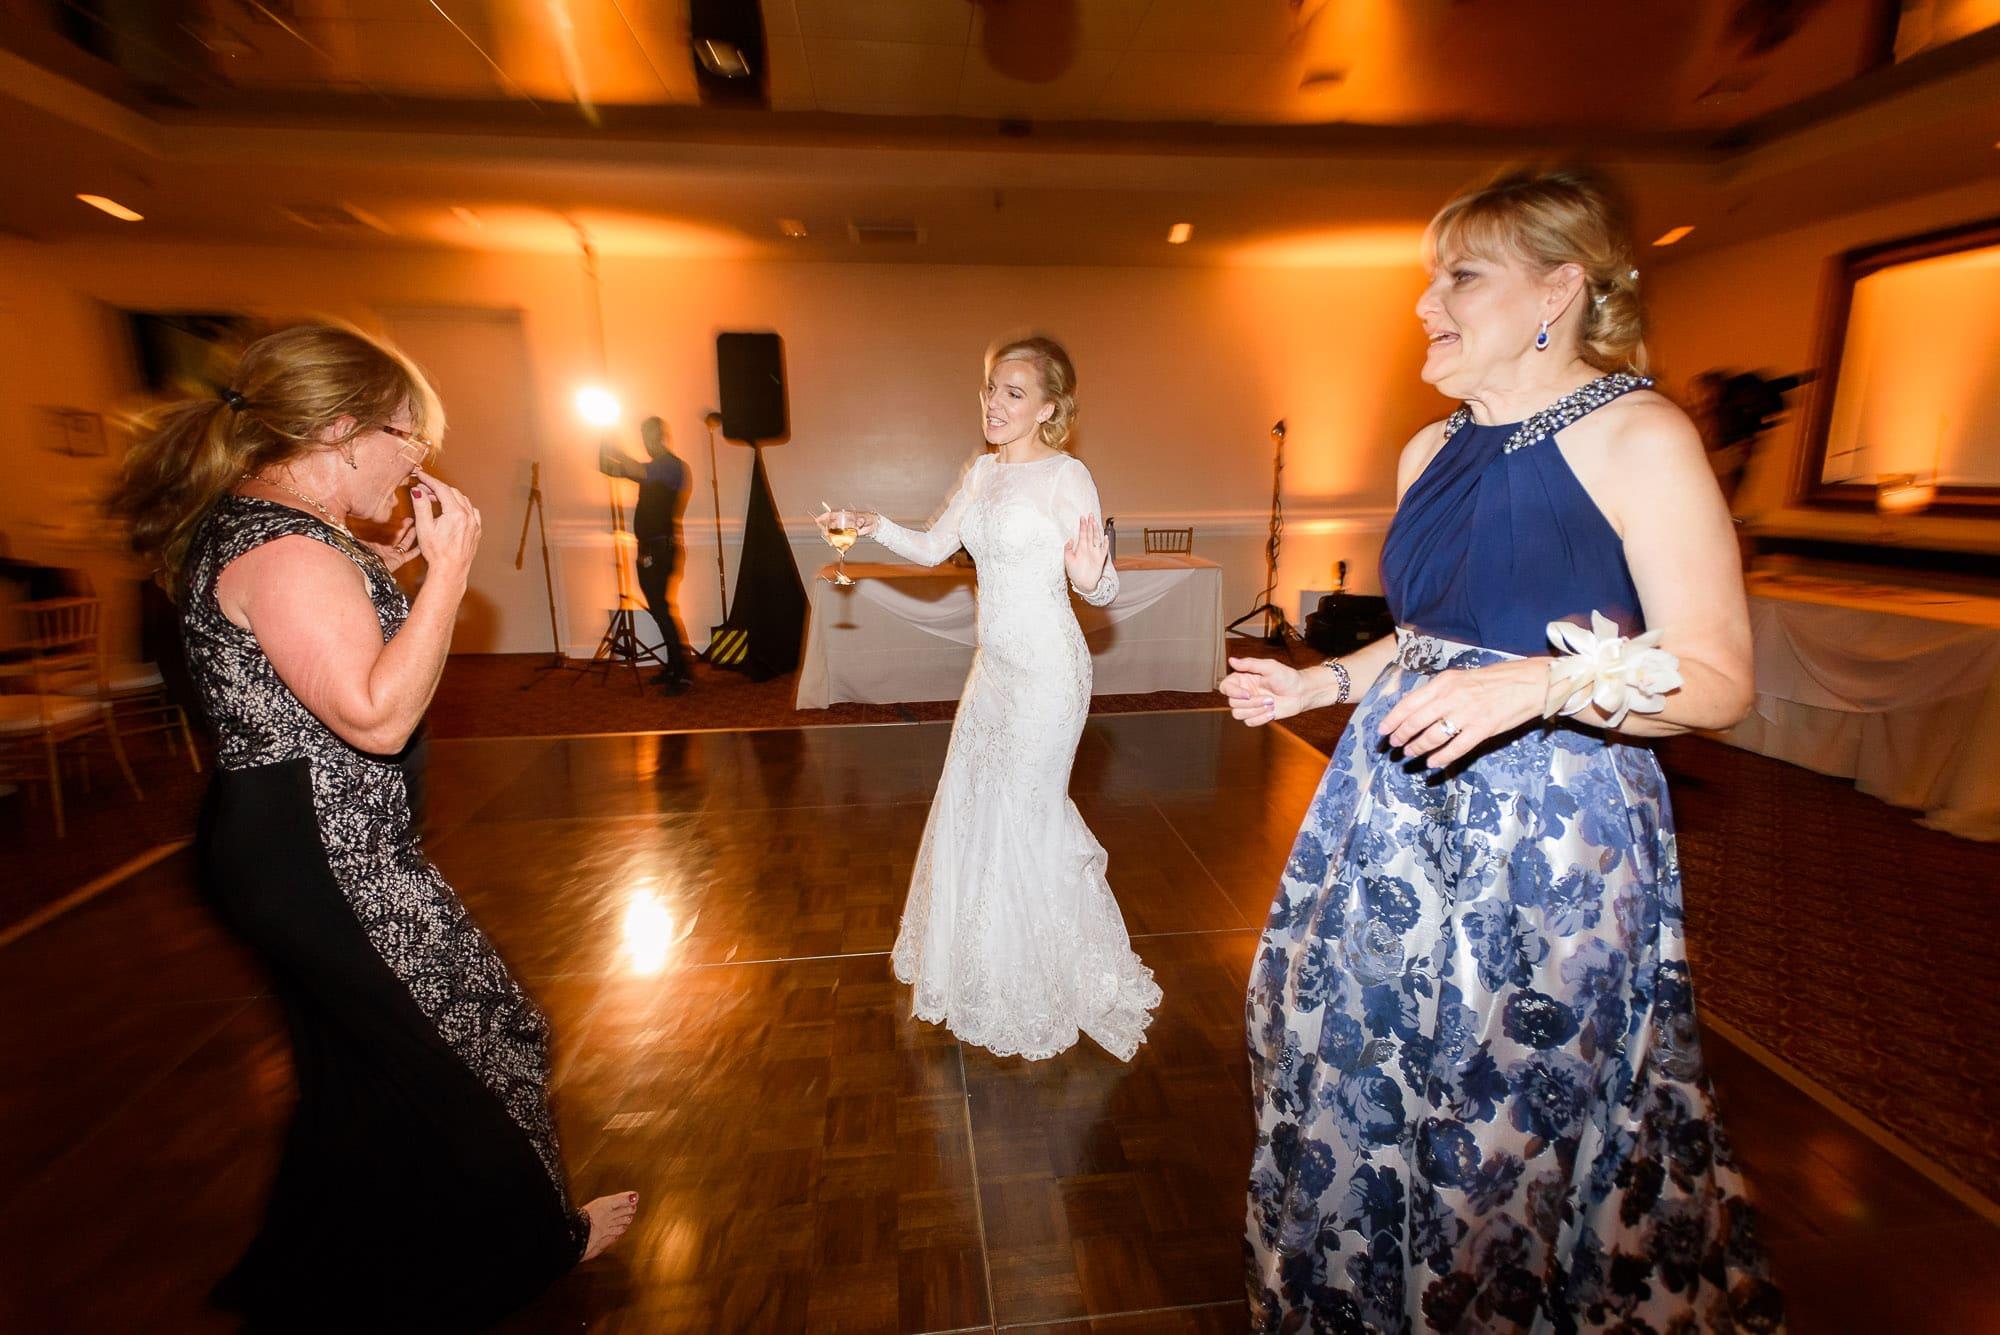 074_Alan_and_Heidi_Los_Angeles_Equestrian_Center_Wedding